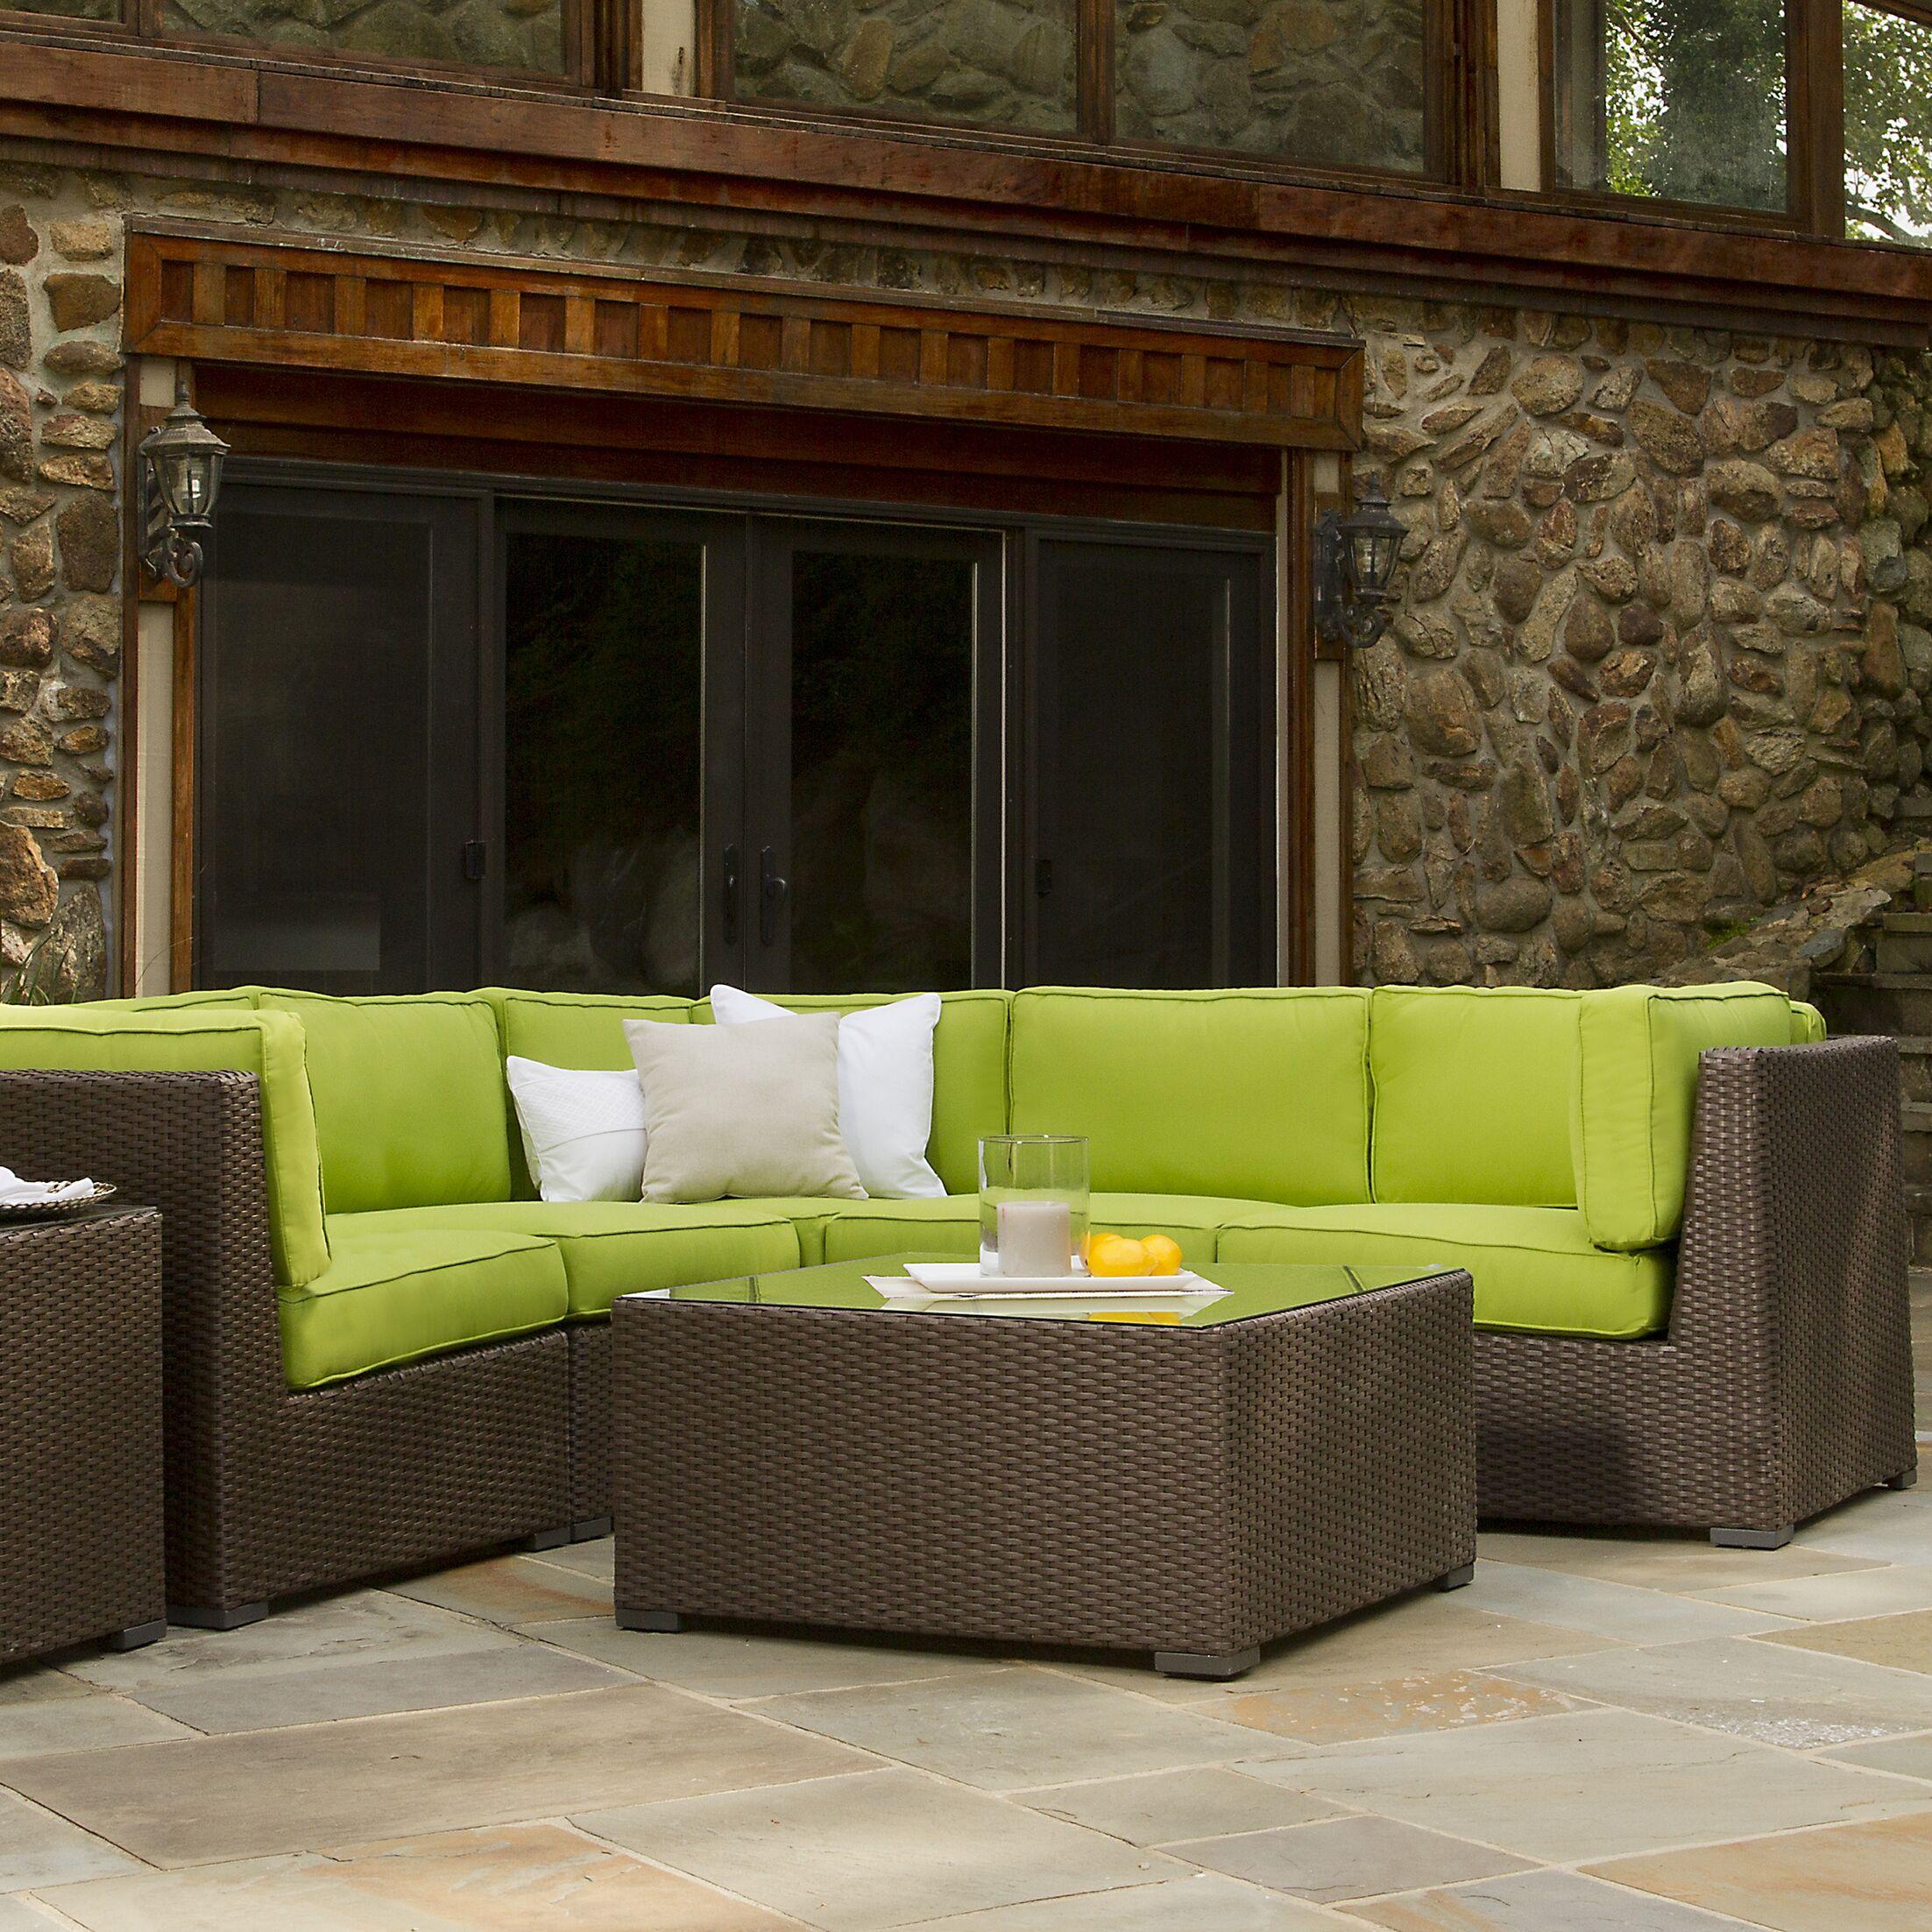 Sonoma Sunbrella Sectional Set with Cushions Color: Sunbrella Antique Beige